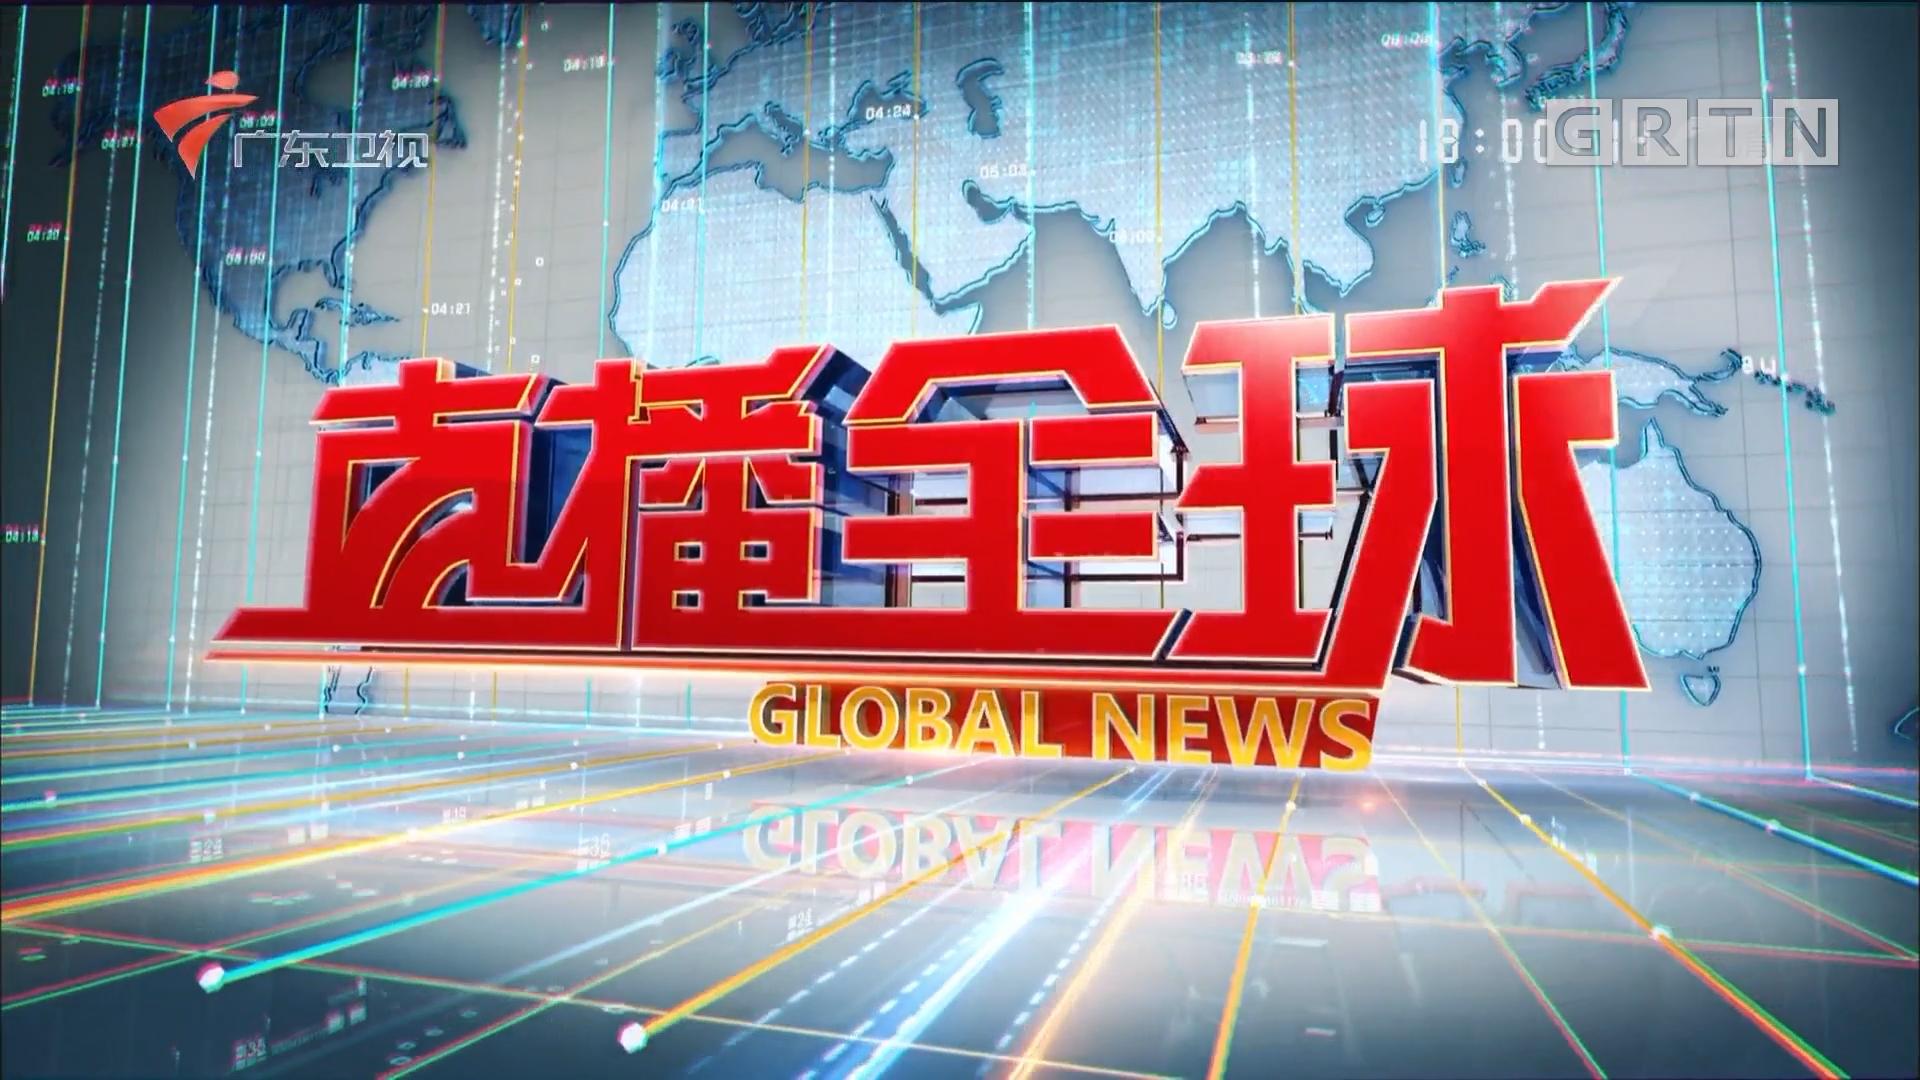 [HD][2018-04-20]直播全球:韩朝首脑热线今日有望开通:尚未确定文在寅与金正恩首次通话时间